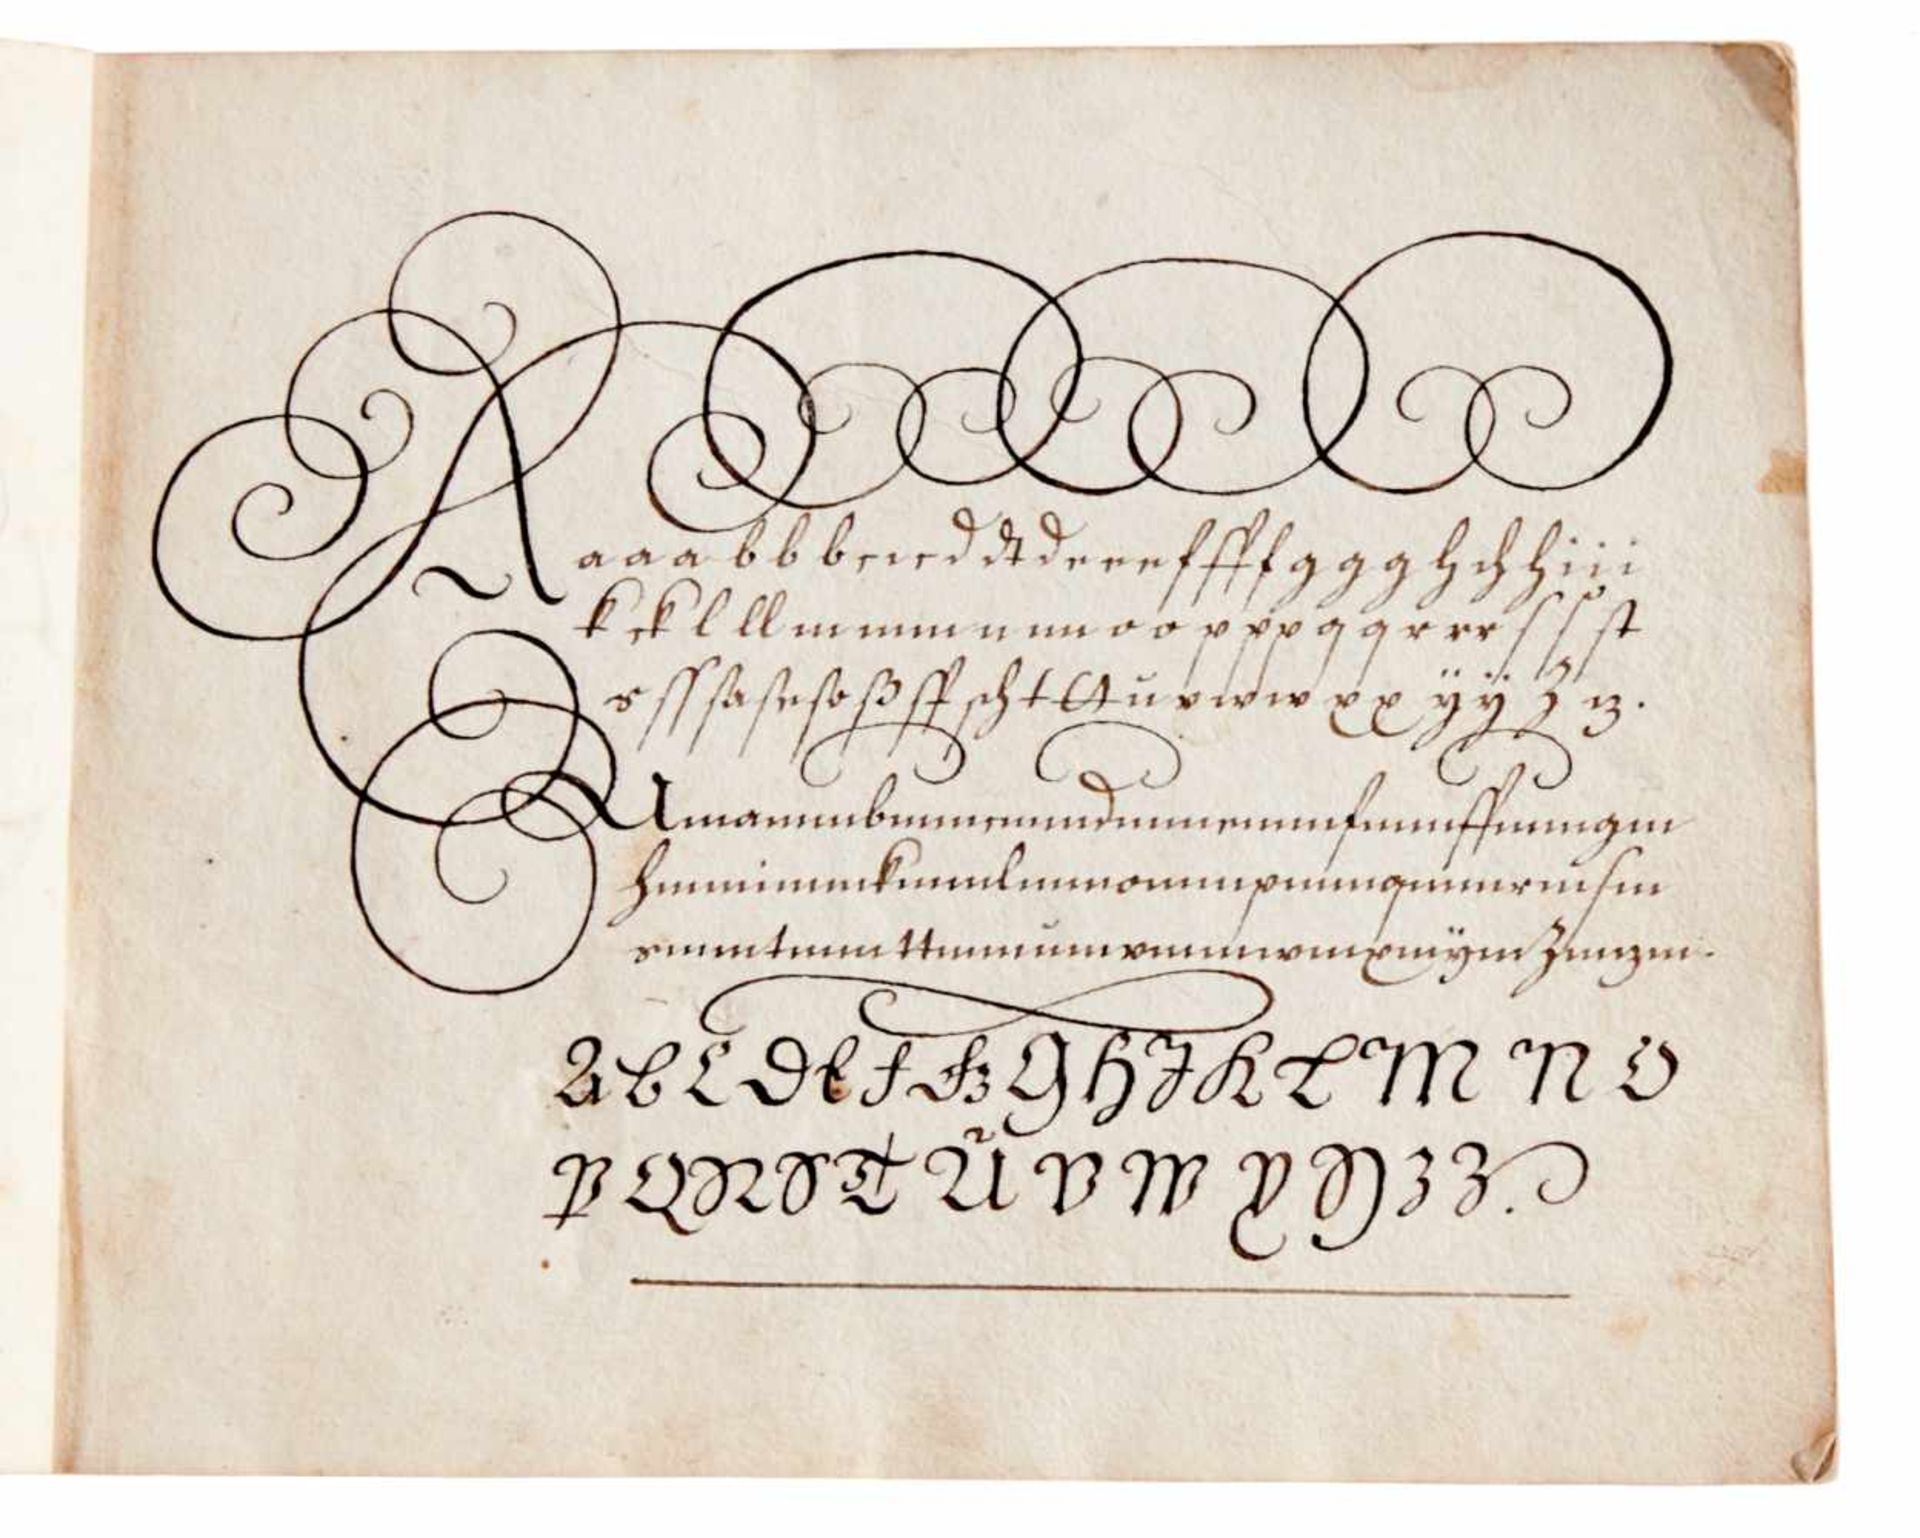 Schreibmeisterbuch - Abschrift des seltenen, um 1713 inNürnberg bei Johann Christoph Weigel - Bild 3 aus 5